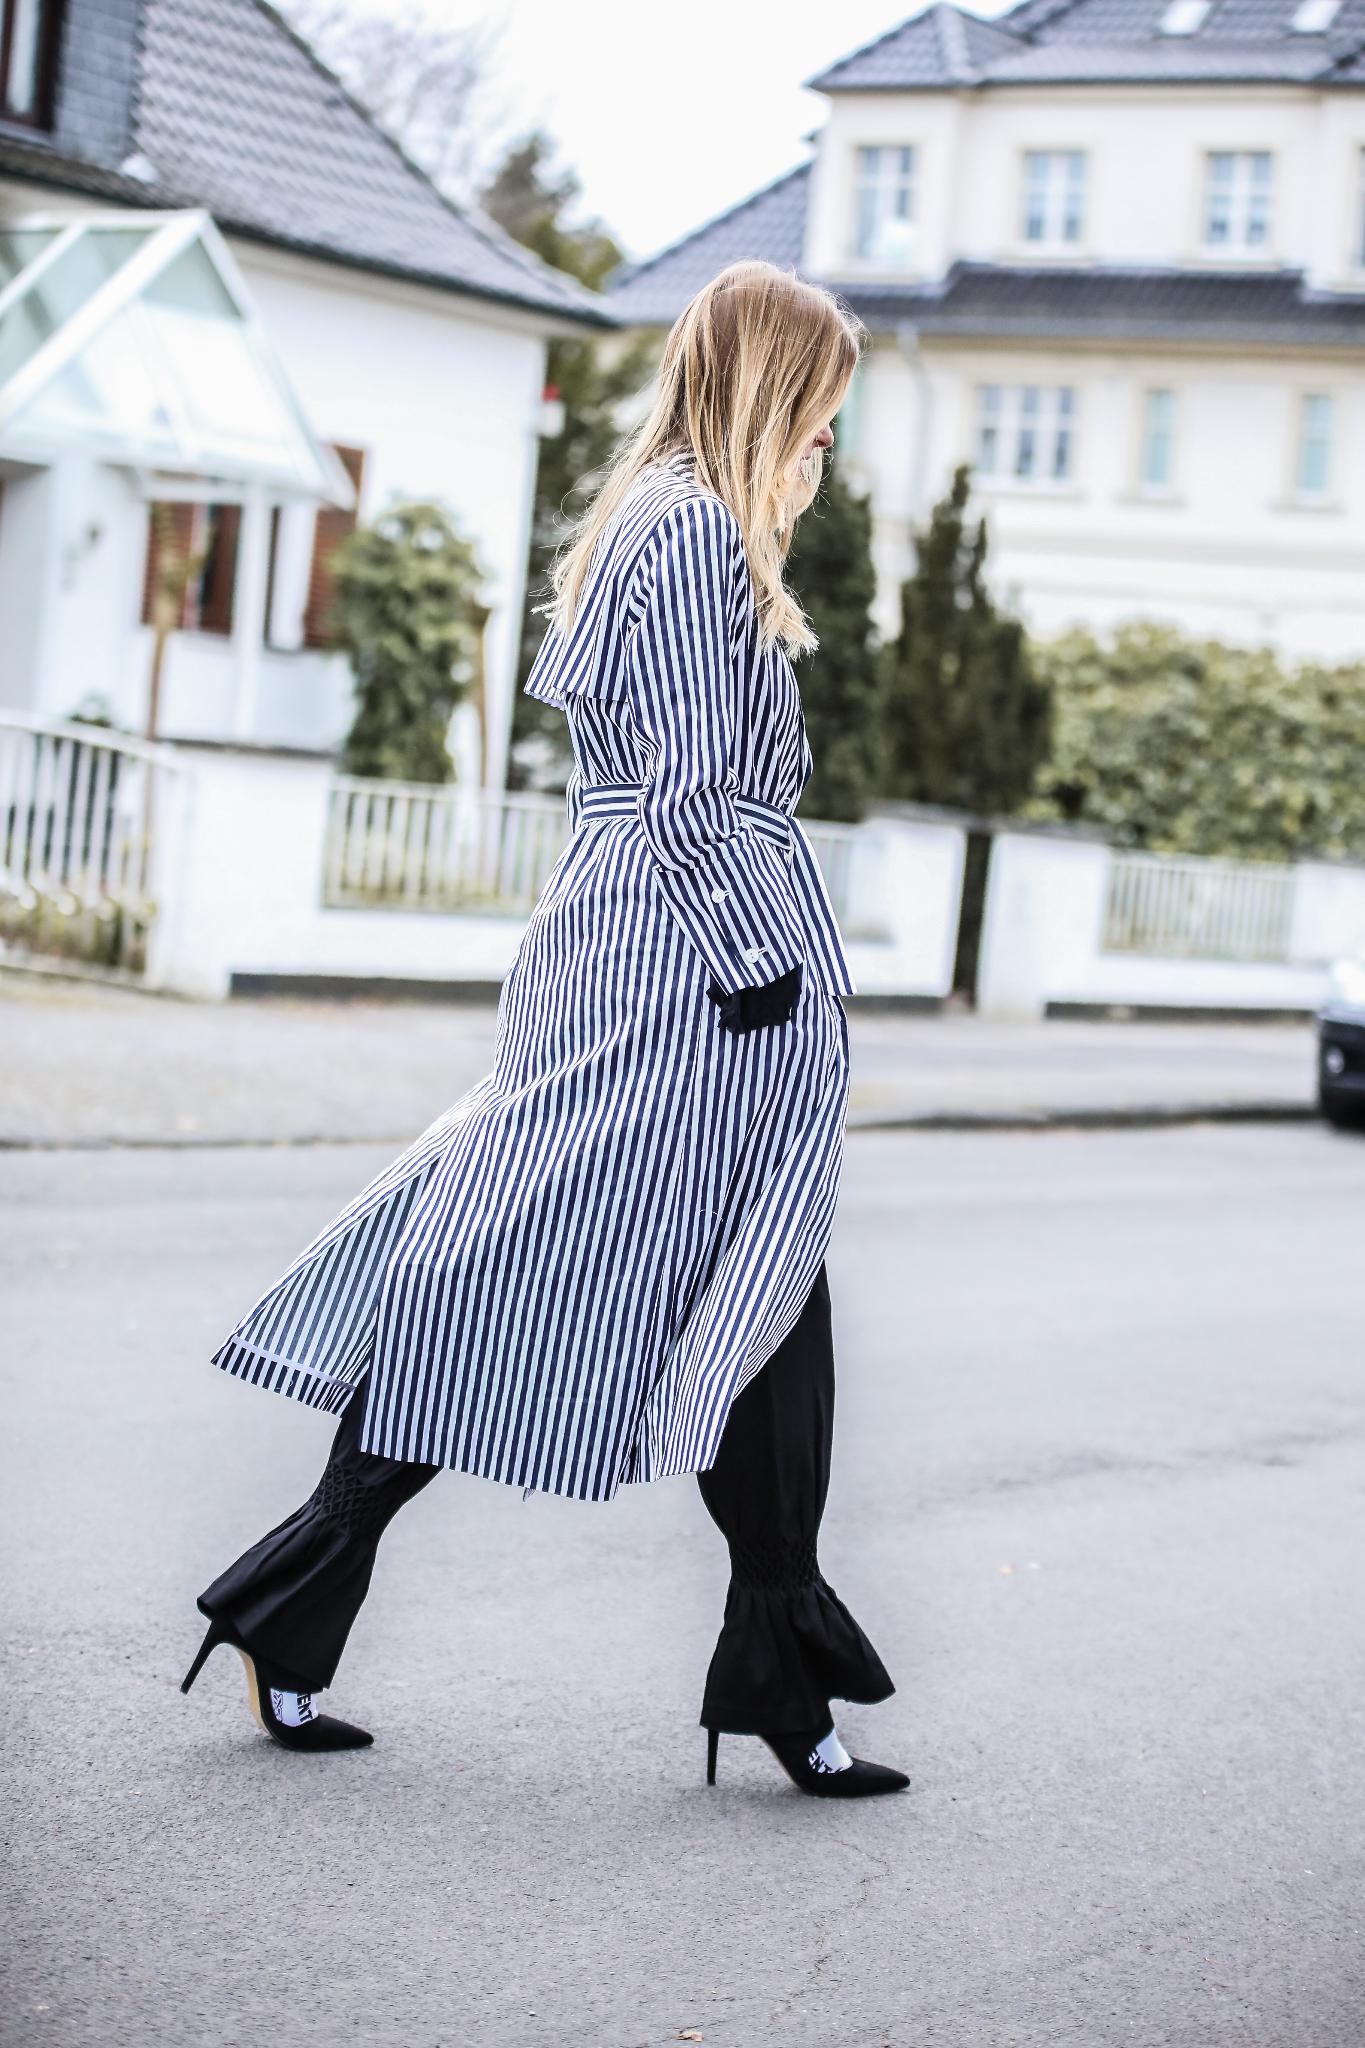 MOD-by-Monique-Fashion-Looks-Striped-Coat-Big-Volants-14